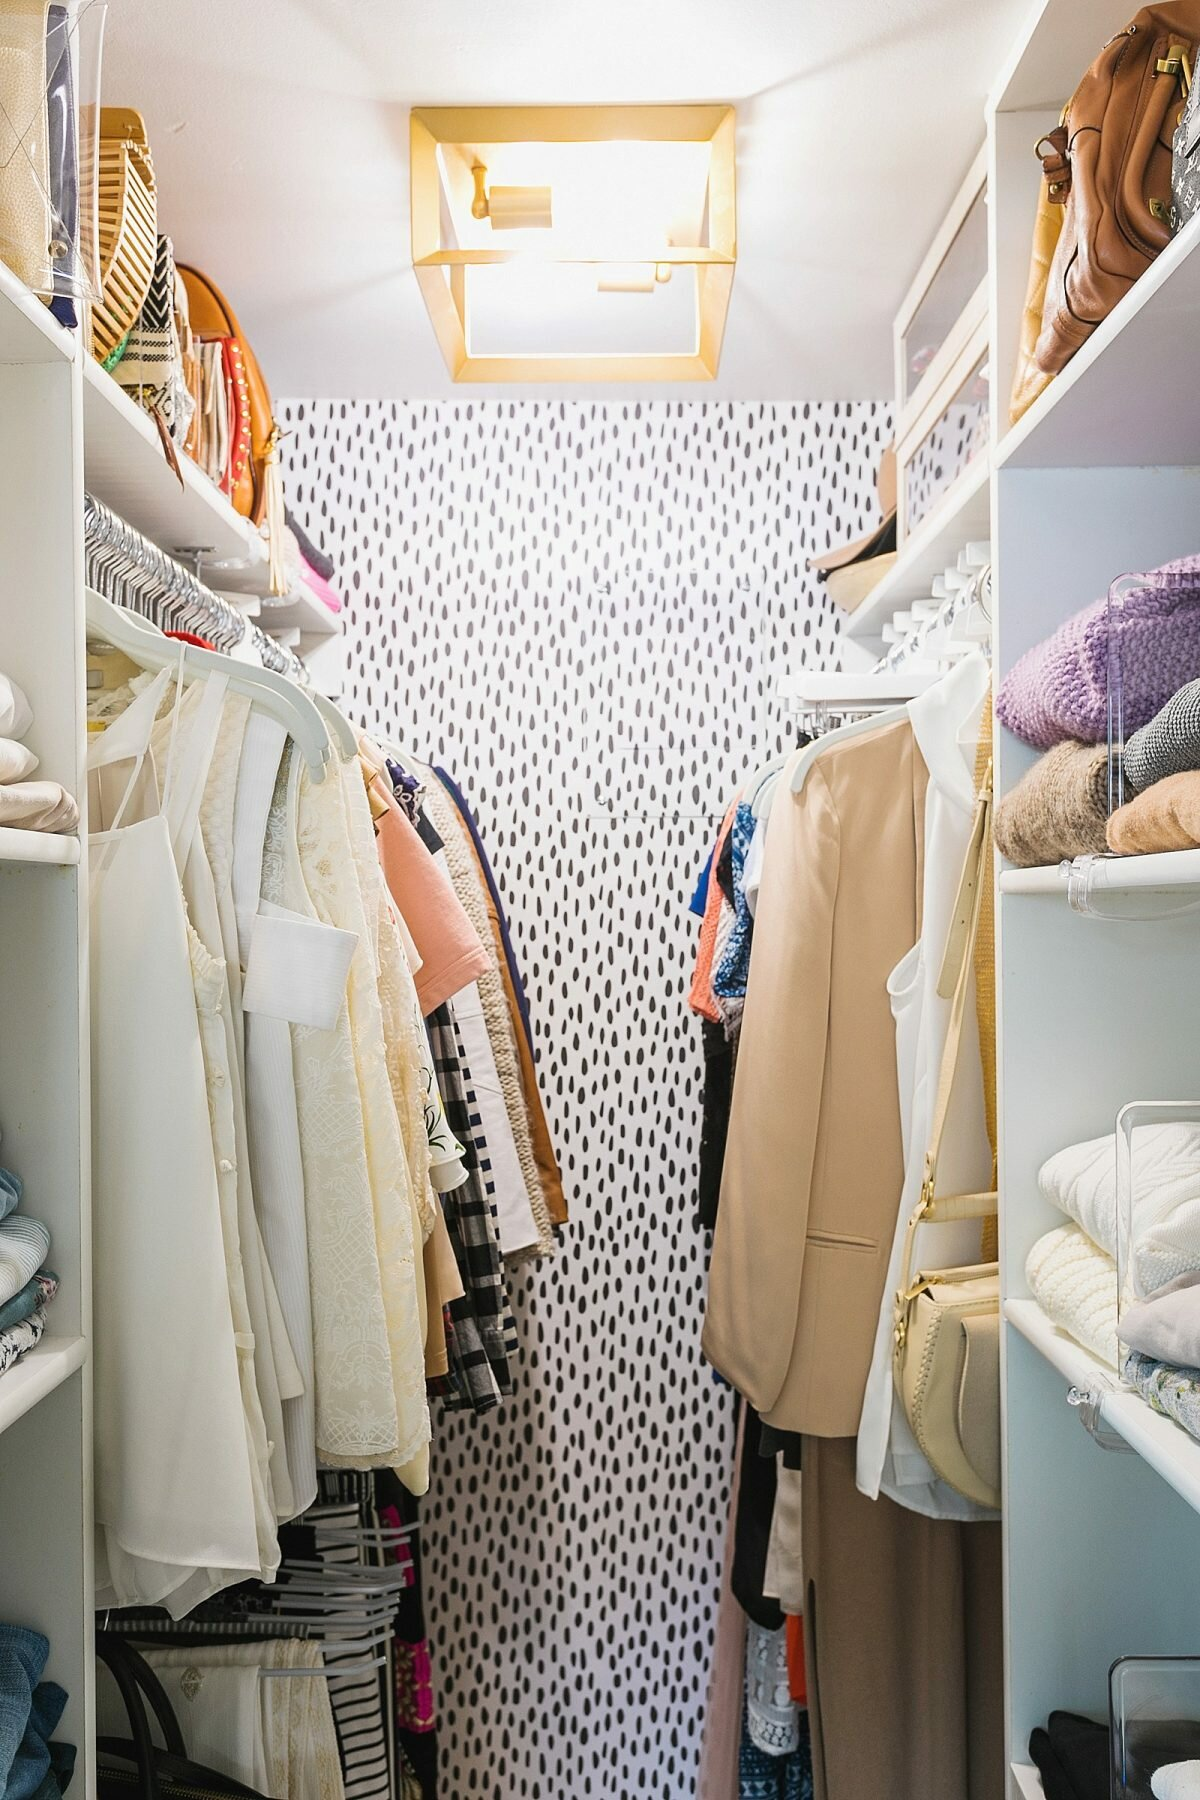 Diana says Closet Systems u0026 Organizers Youu0027ll